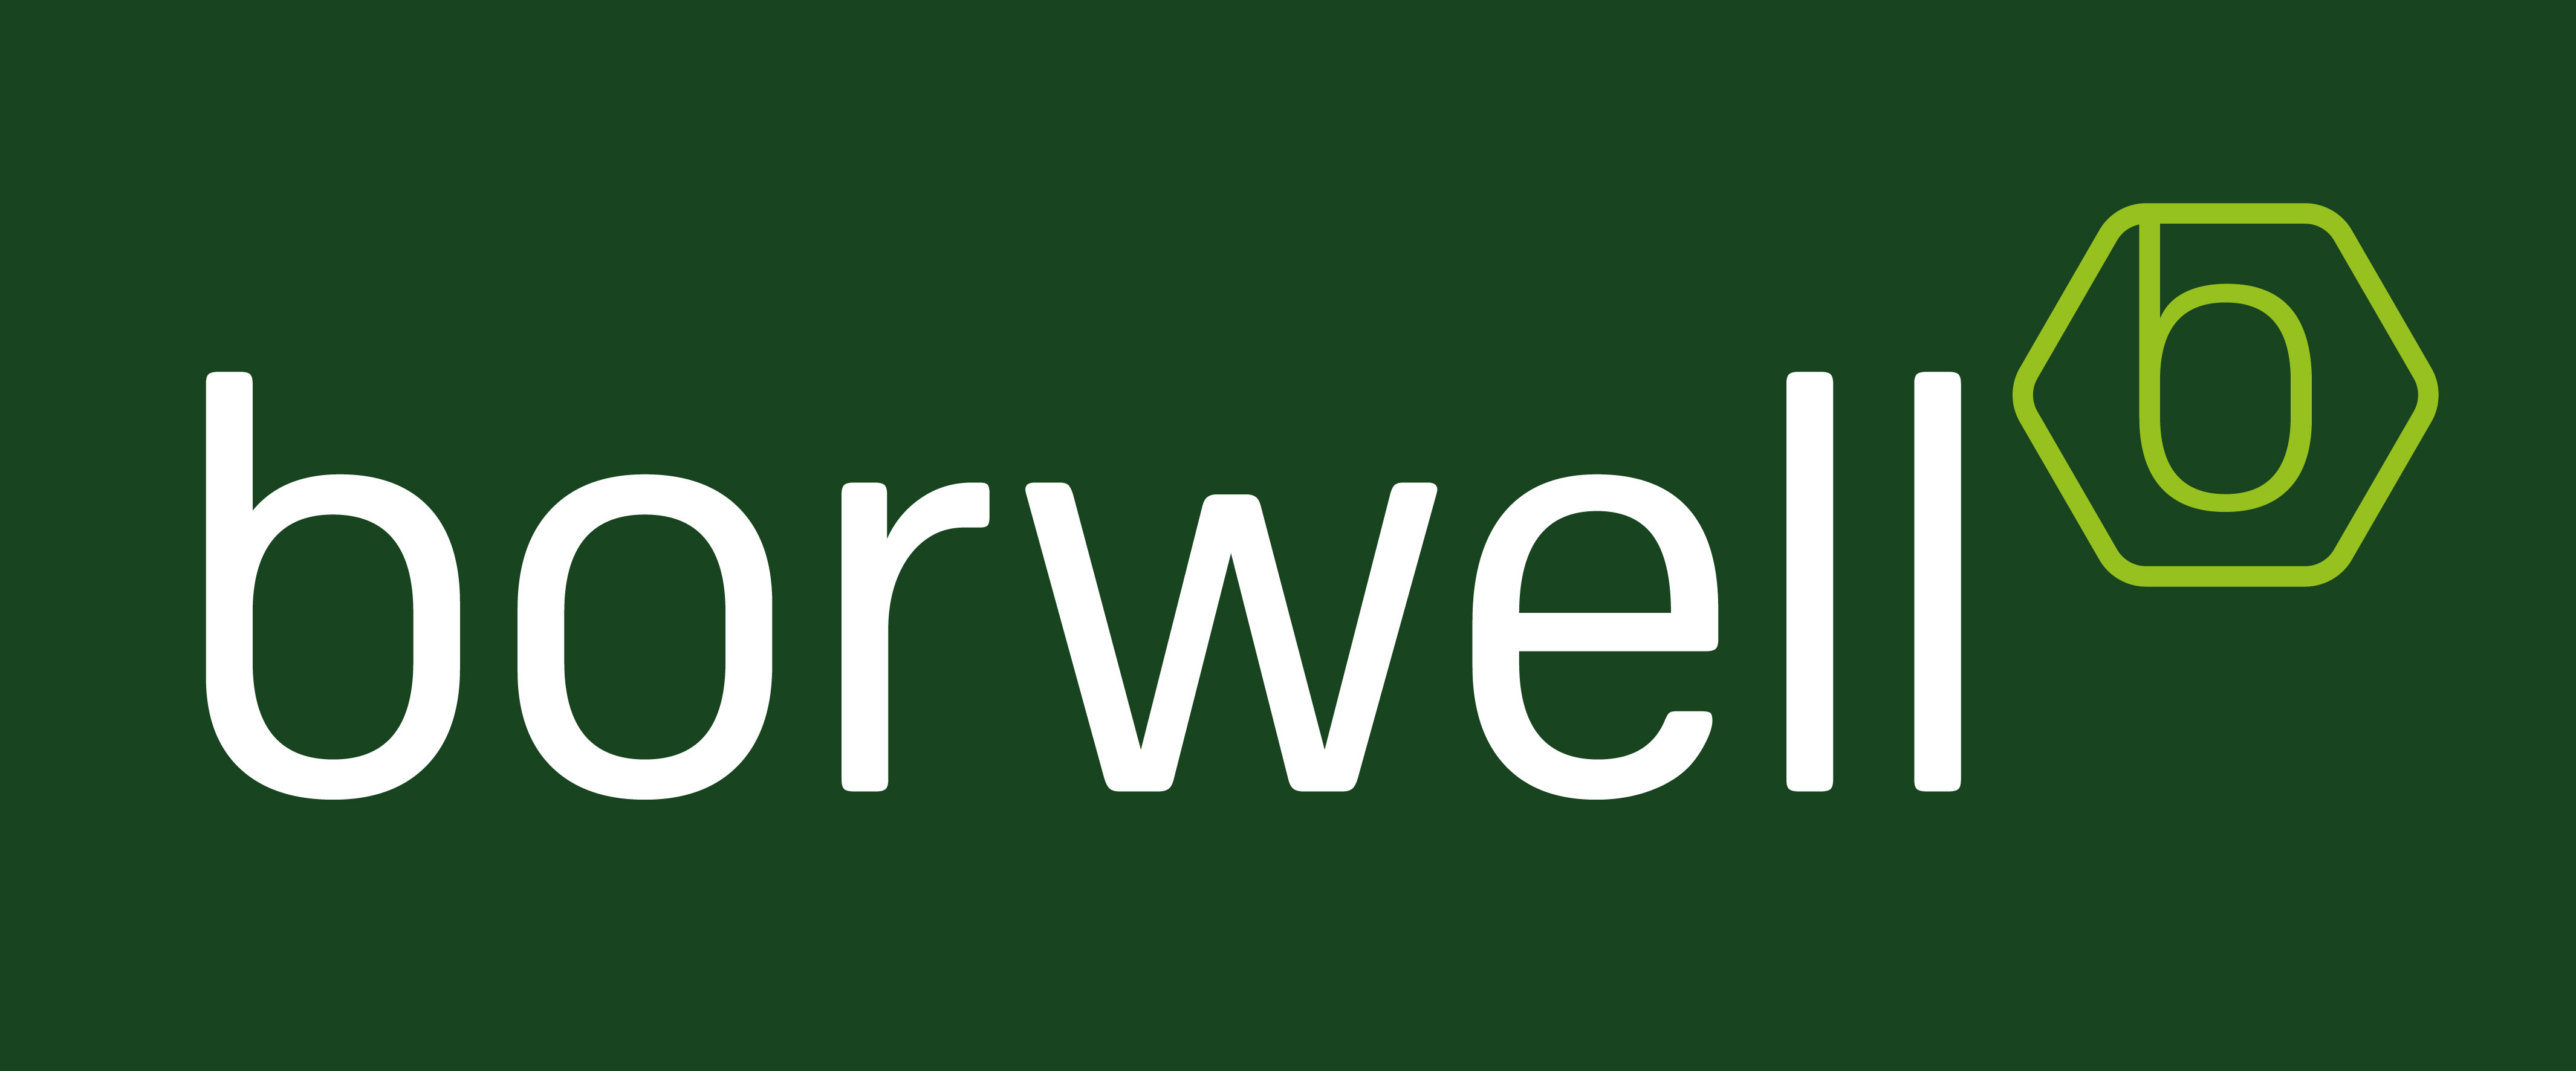 borwell